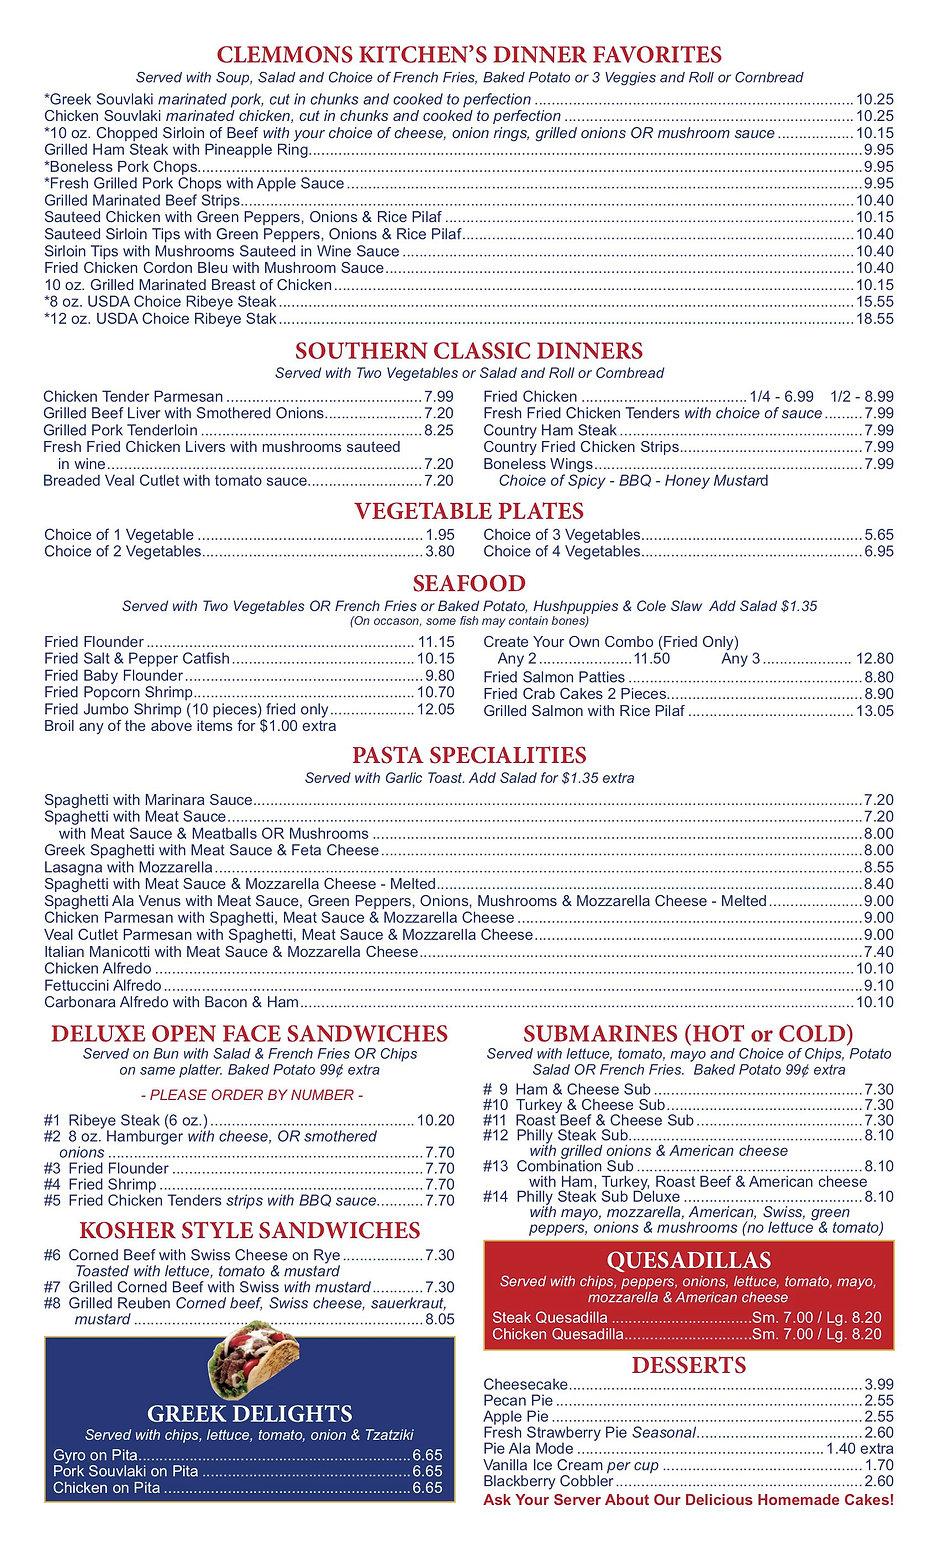 Clemmons Kitchen menu 20202.jpg